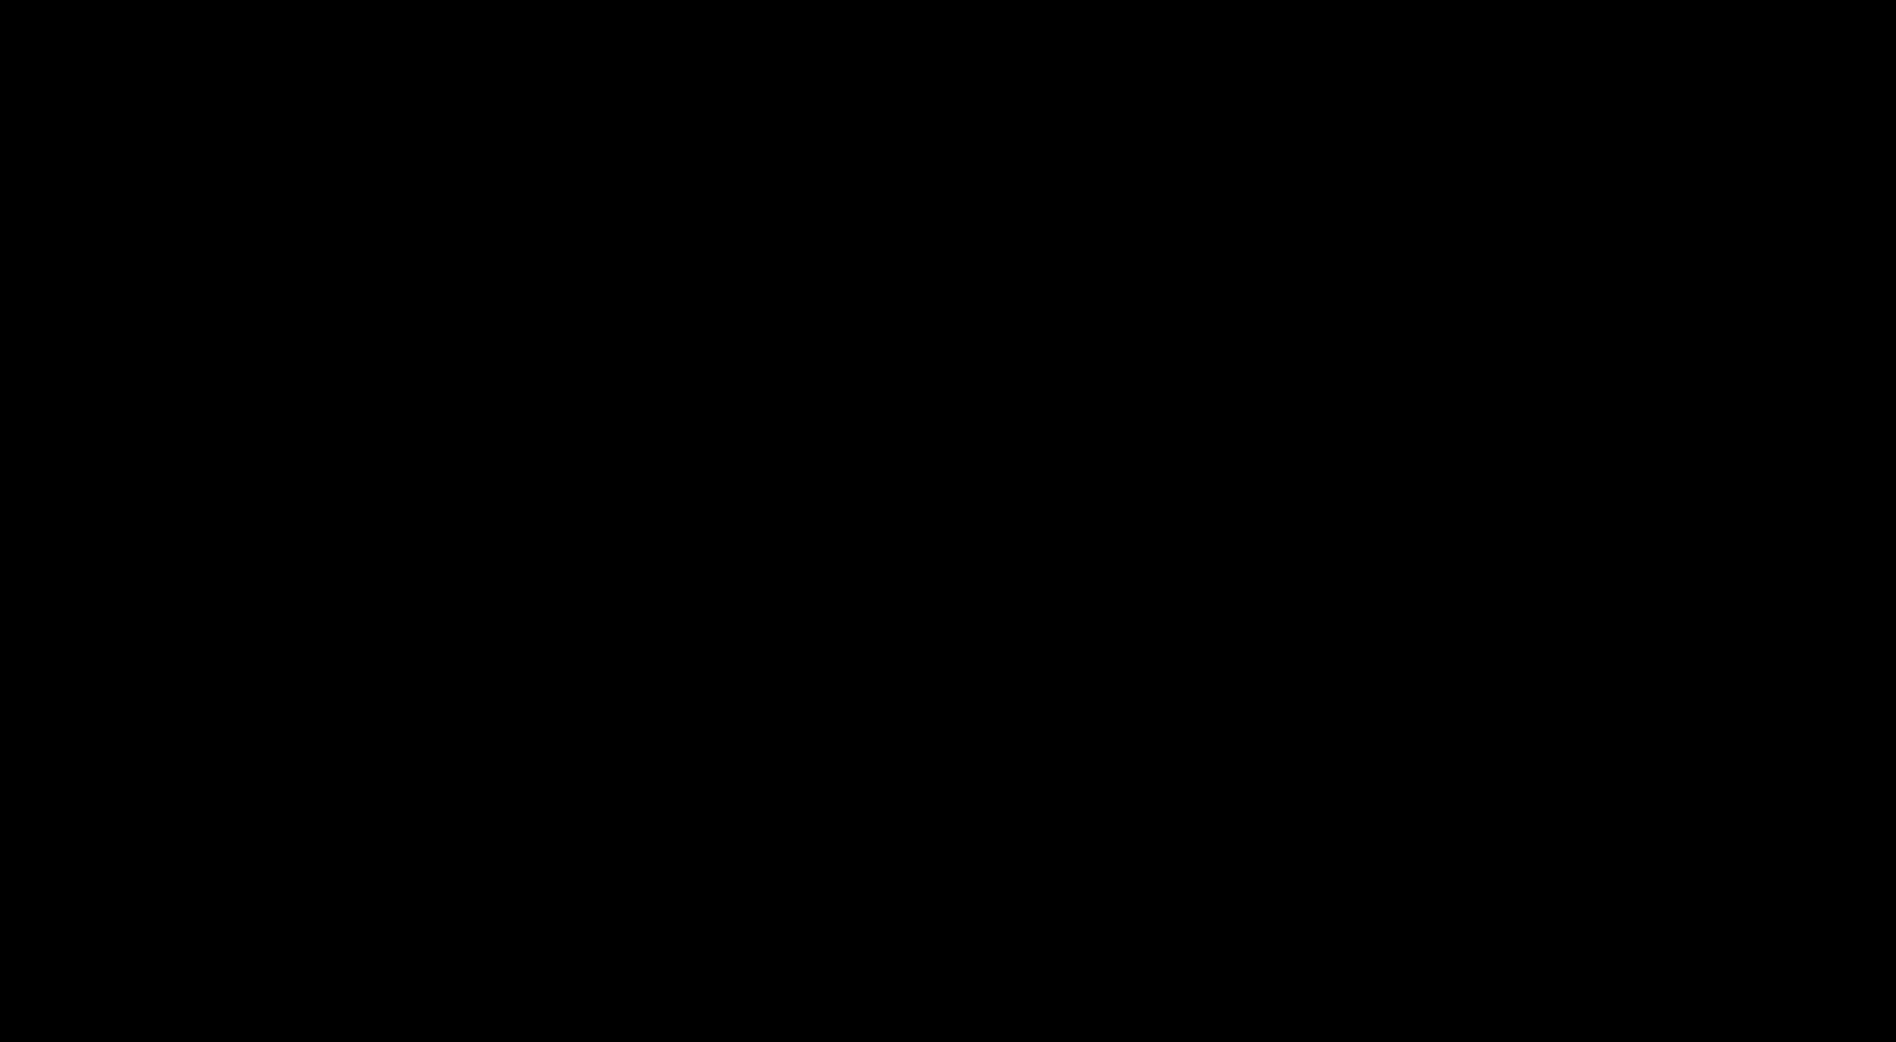 N-Biotinyl p-aminophenyl arsinic acid